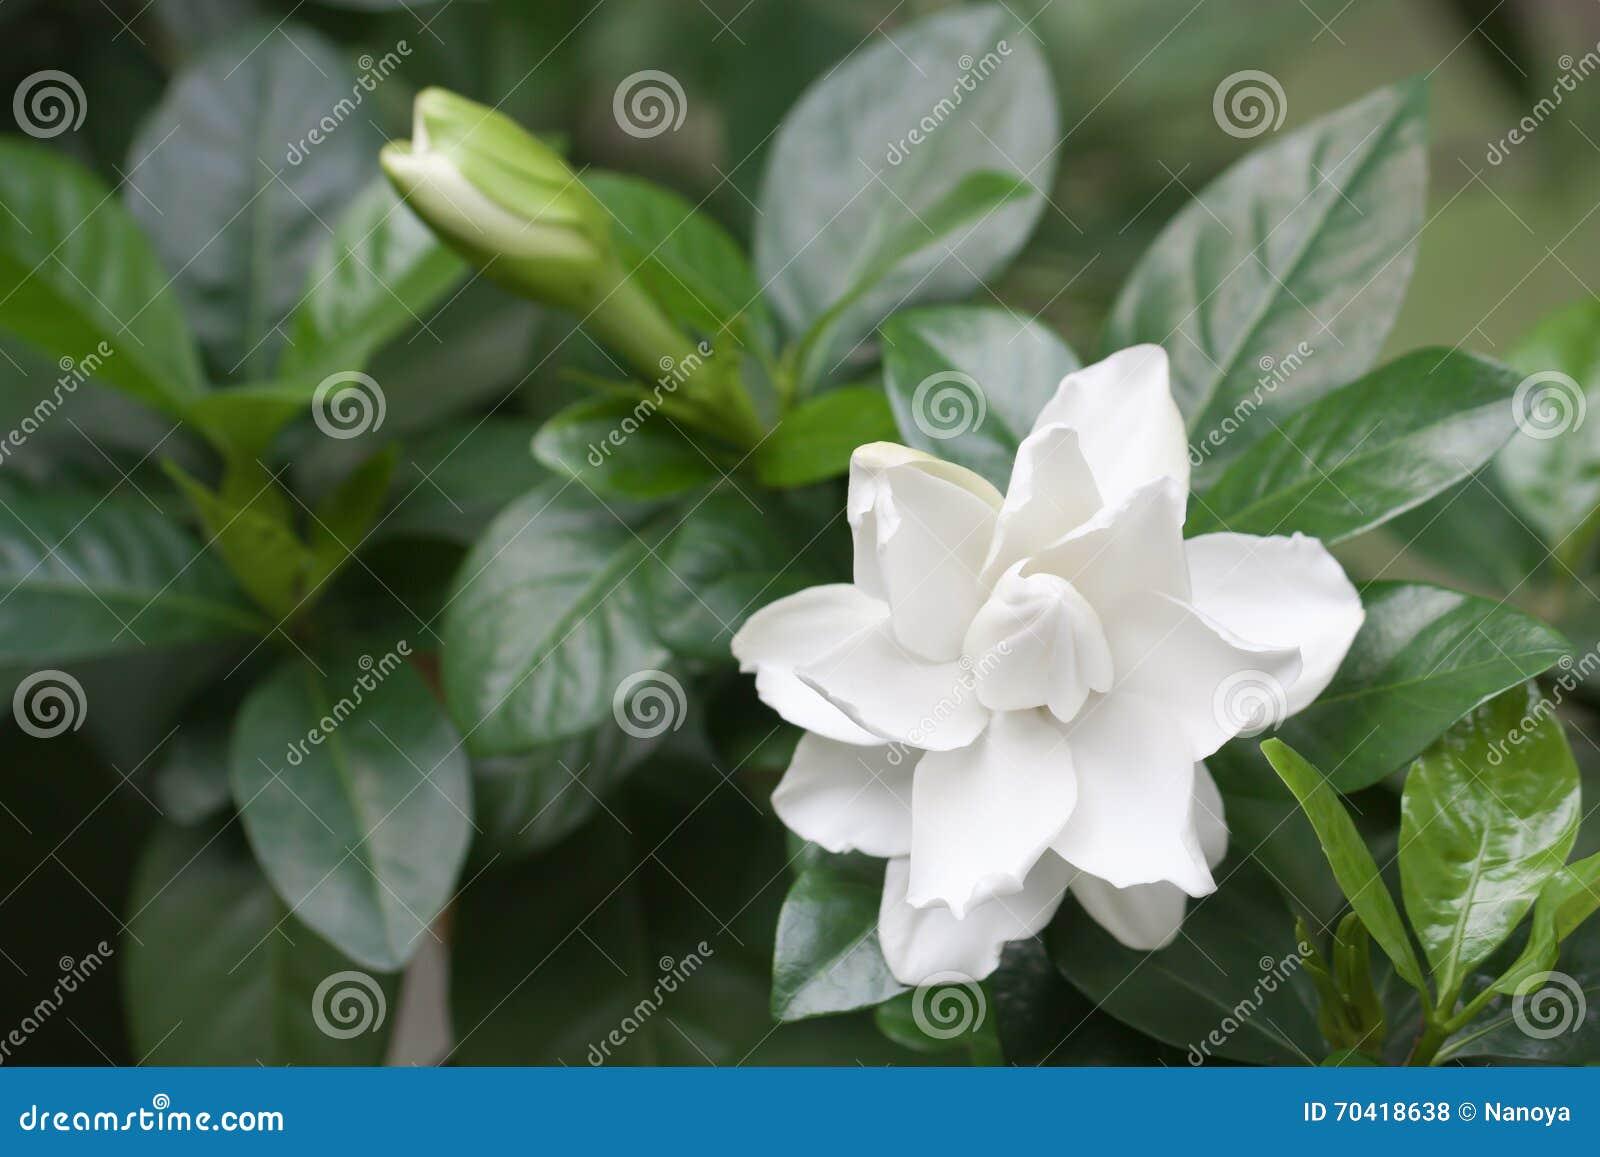 White common gardenia or cape jasmine flower stock photo image of white common gardenia or cape jasmine flower izmirmasajfo